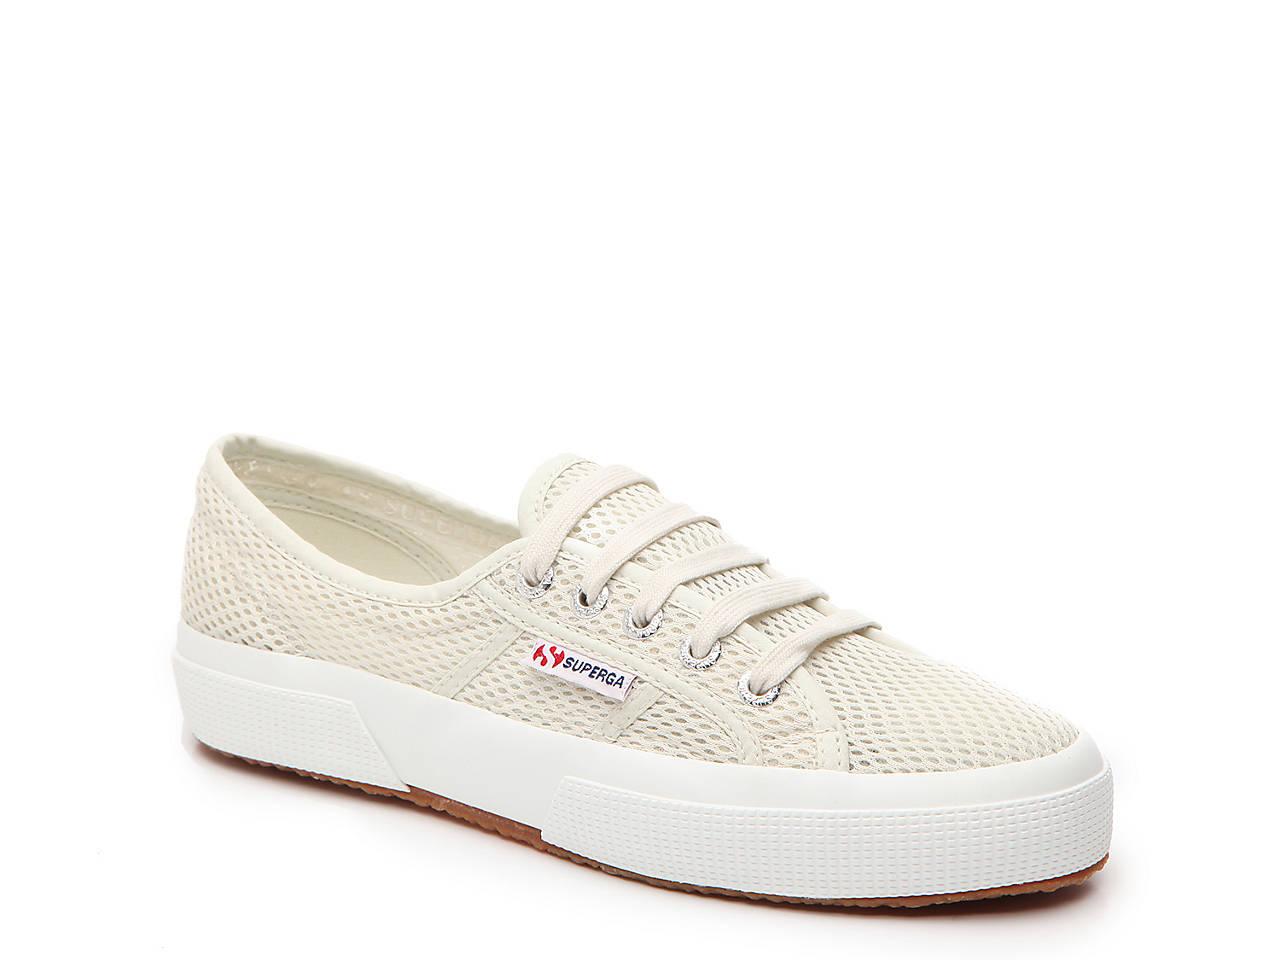 902d8f06d1eaf 2750 Meshu Sneaker